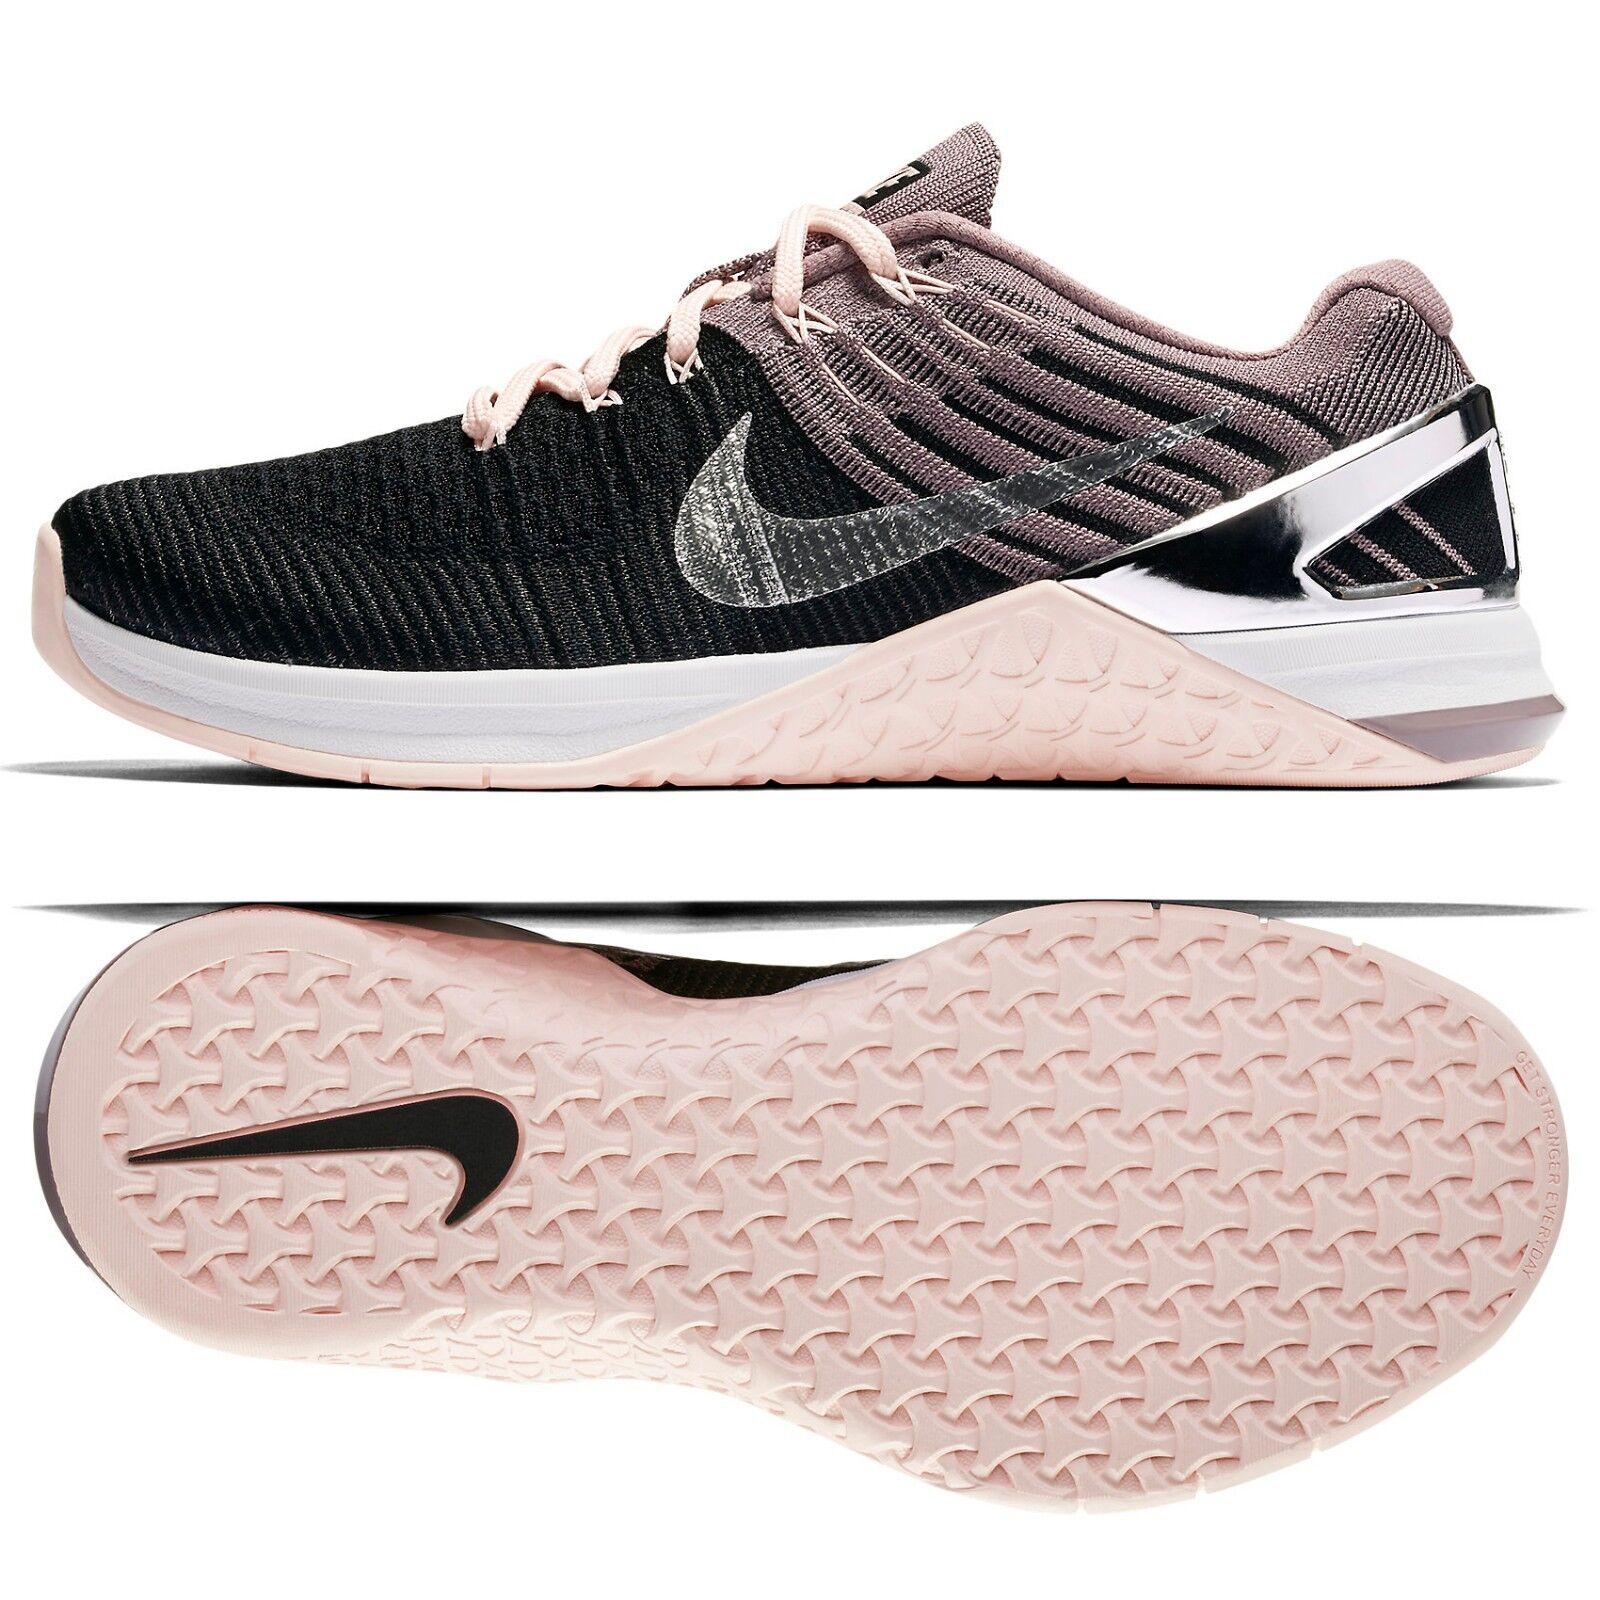 nike Femme metcon dsx flyknit bionic 904659-001 noir 15 gris tint chrome chaussure s z 15 noir d6e918